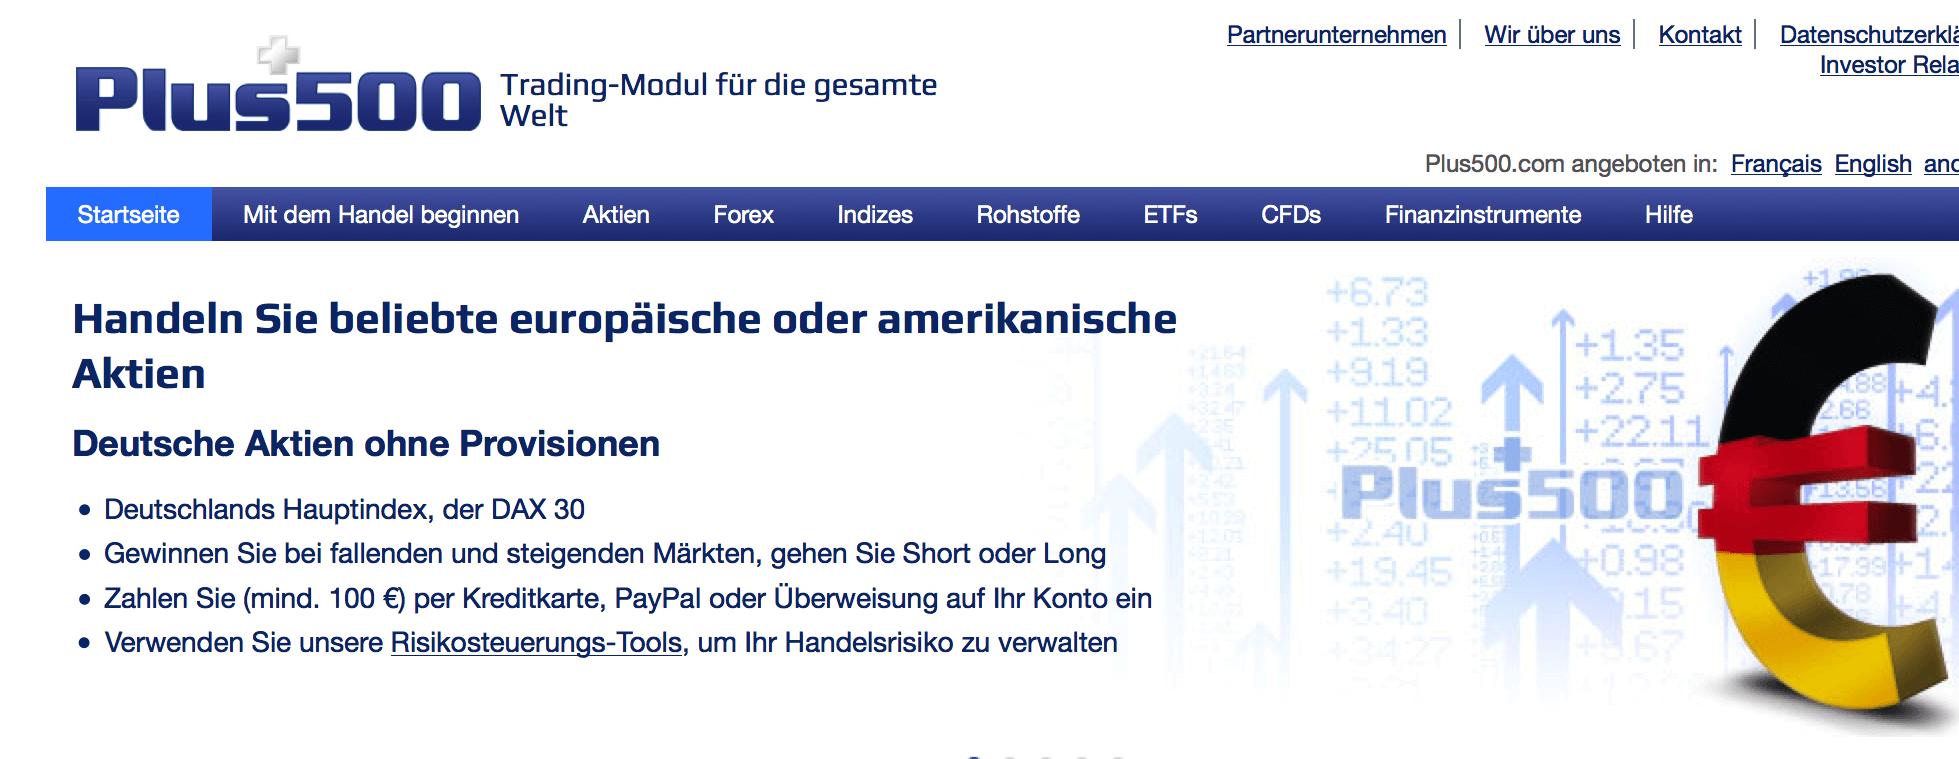 "Playtech übernimmt Skandal-Broker ""Plus500"""